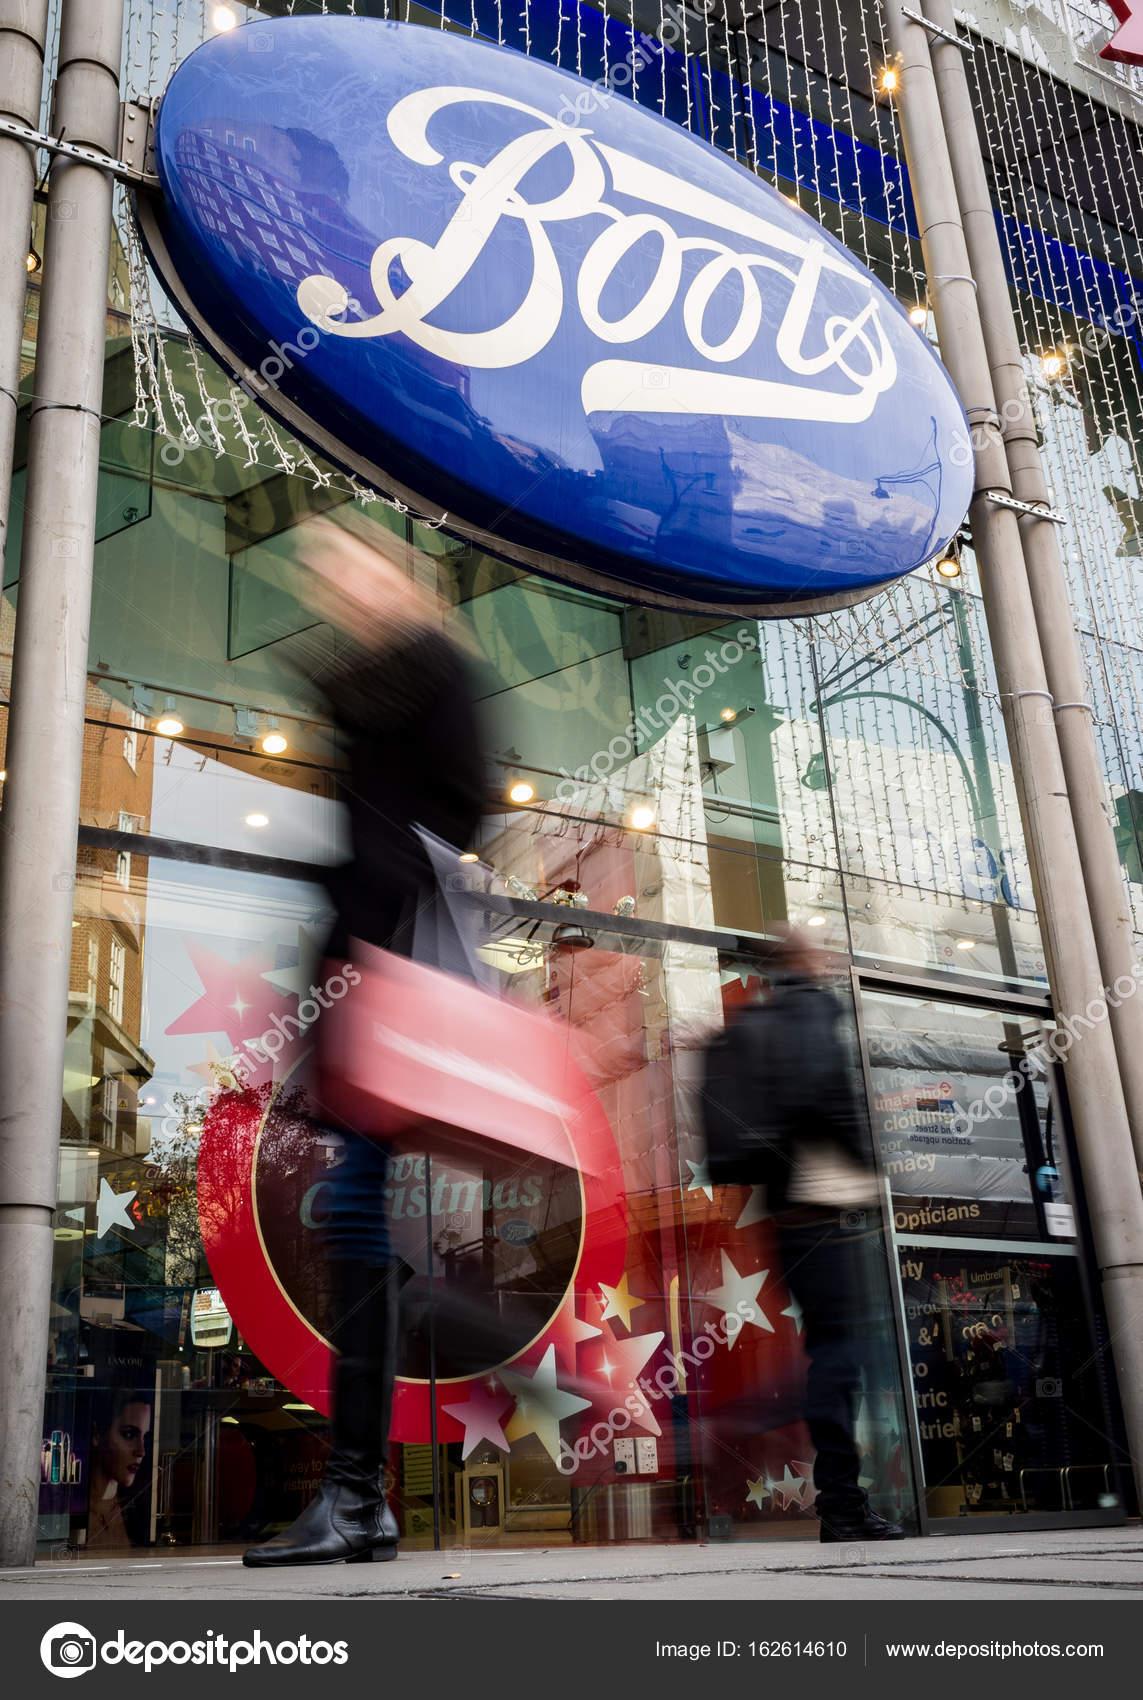 Boots, Oxford Street, London \u2013 Stock Editorial Photo © pxl